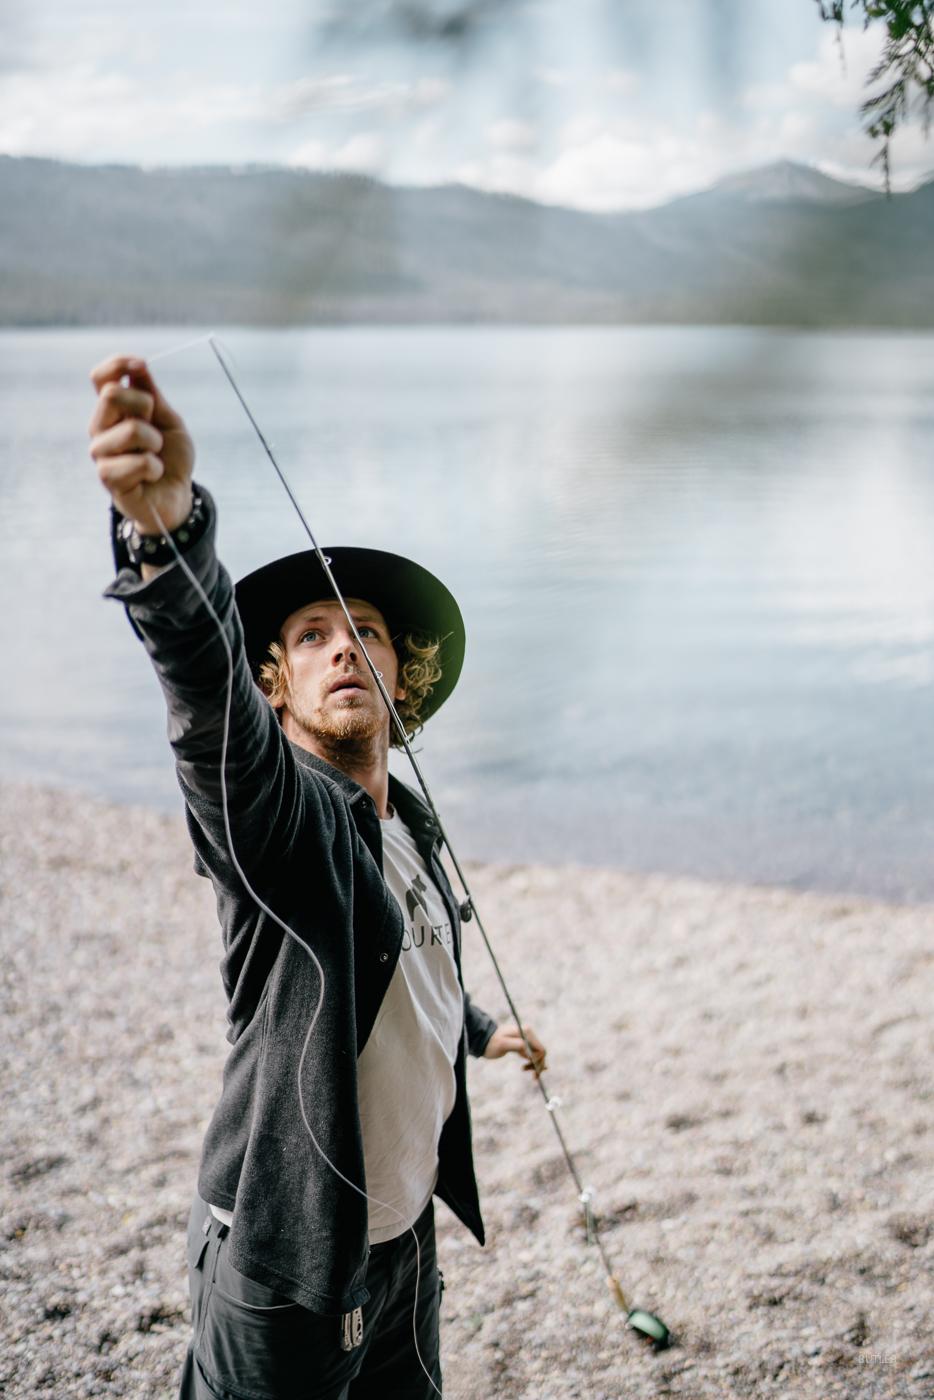 toby-butler-england-devon-lifestyle-photographer-deaddrift-fliyfishing-fishing-aku-glacier-natinalpark-unitedstates-photo-landscape7